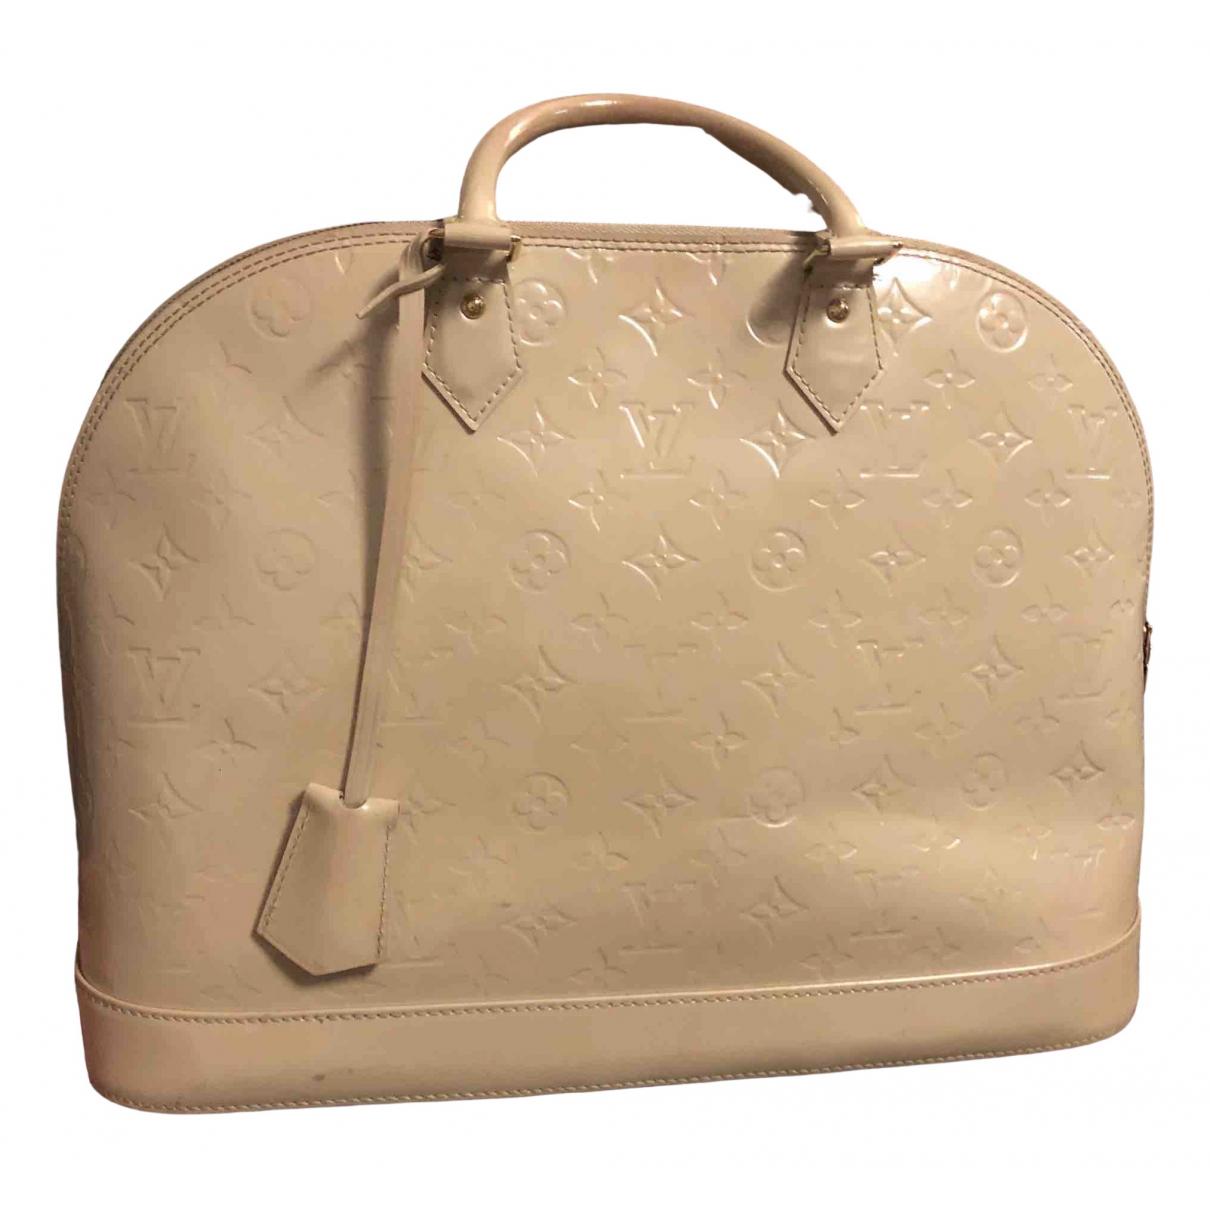 Louis Vuitton Alma Handtasche in  Ecru Lackleder